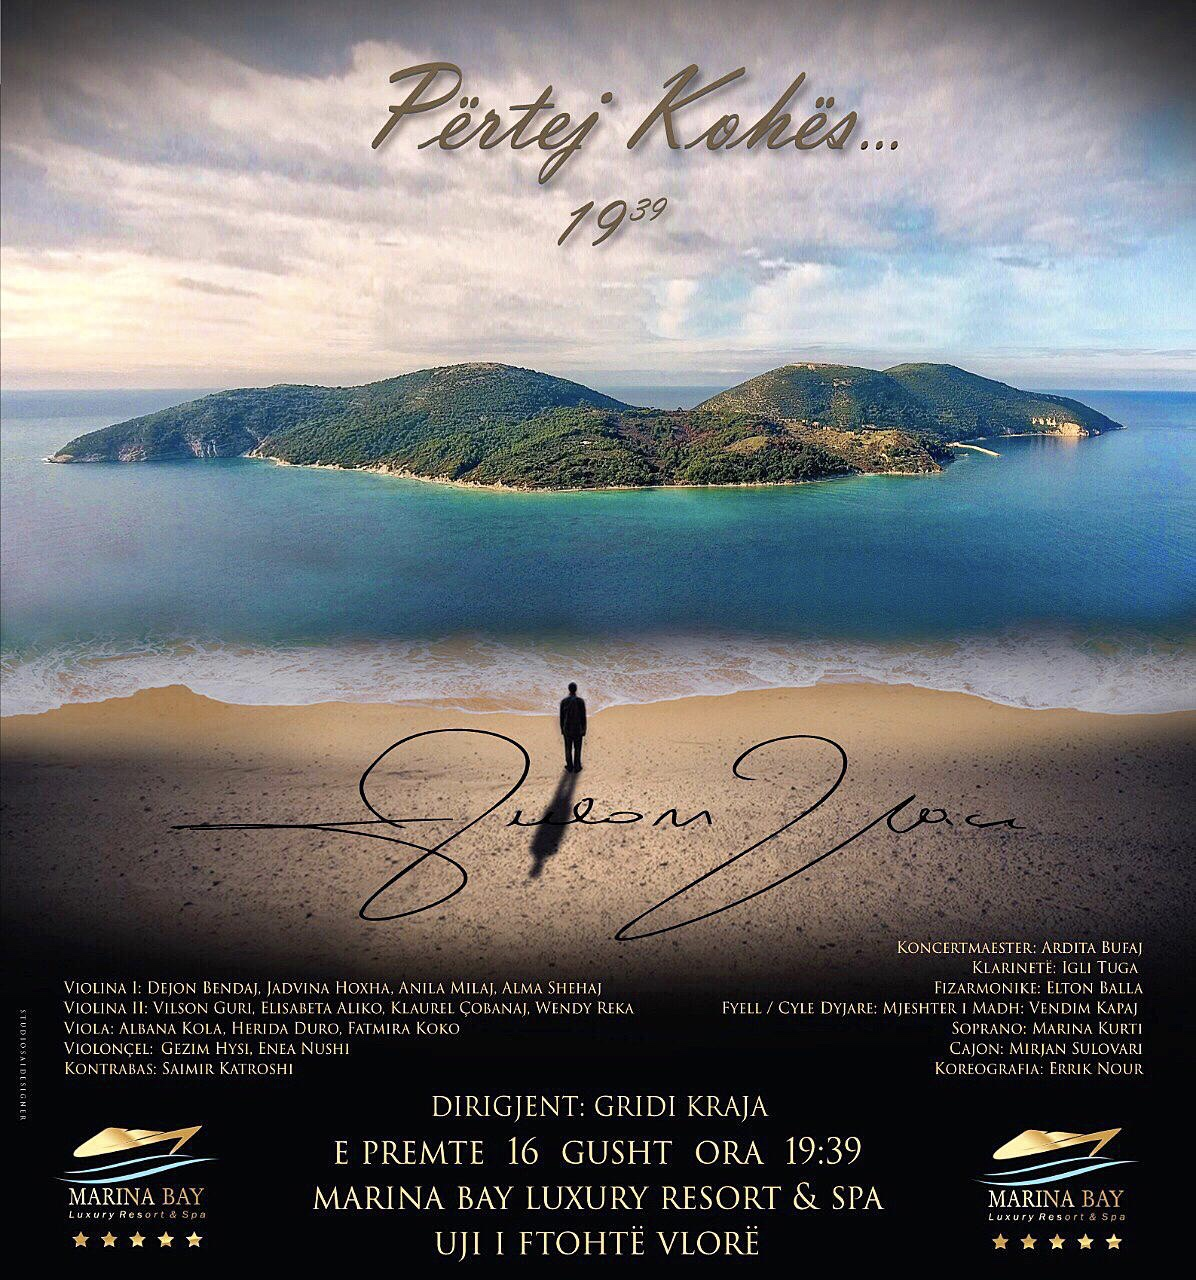 «Përtej kohës» [beyond time], the 16 August concert by Aulon Naçi